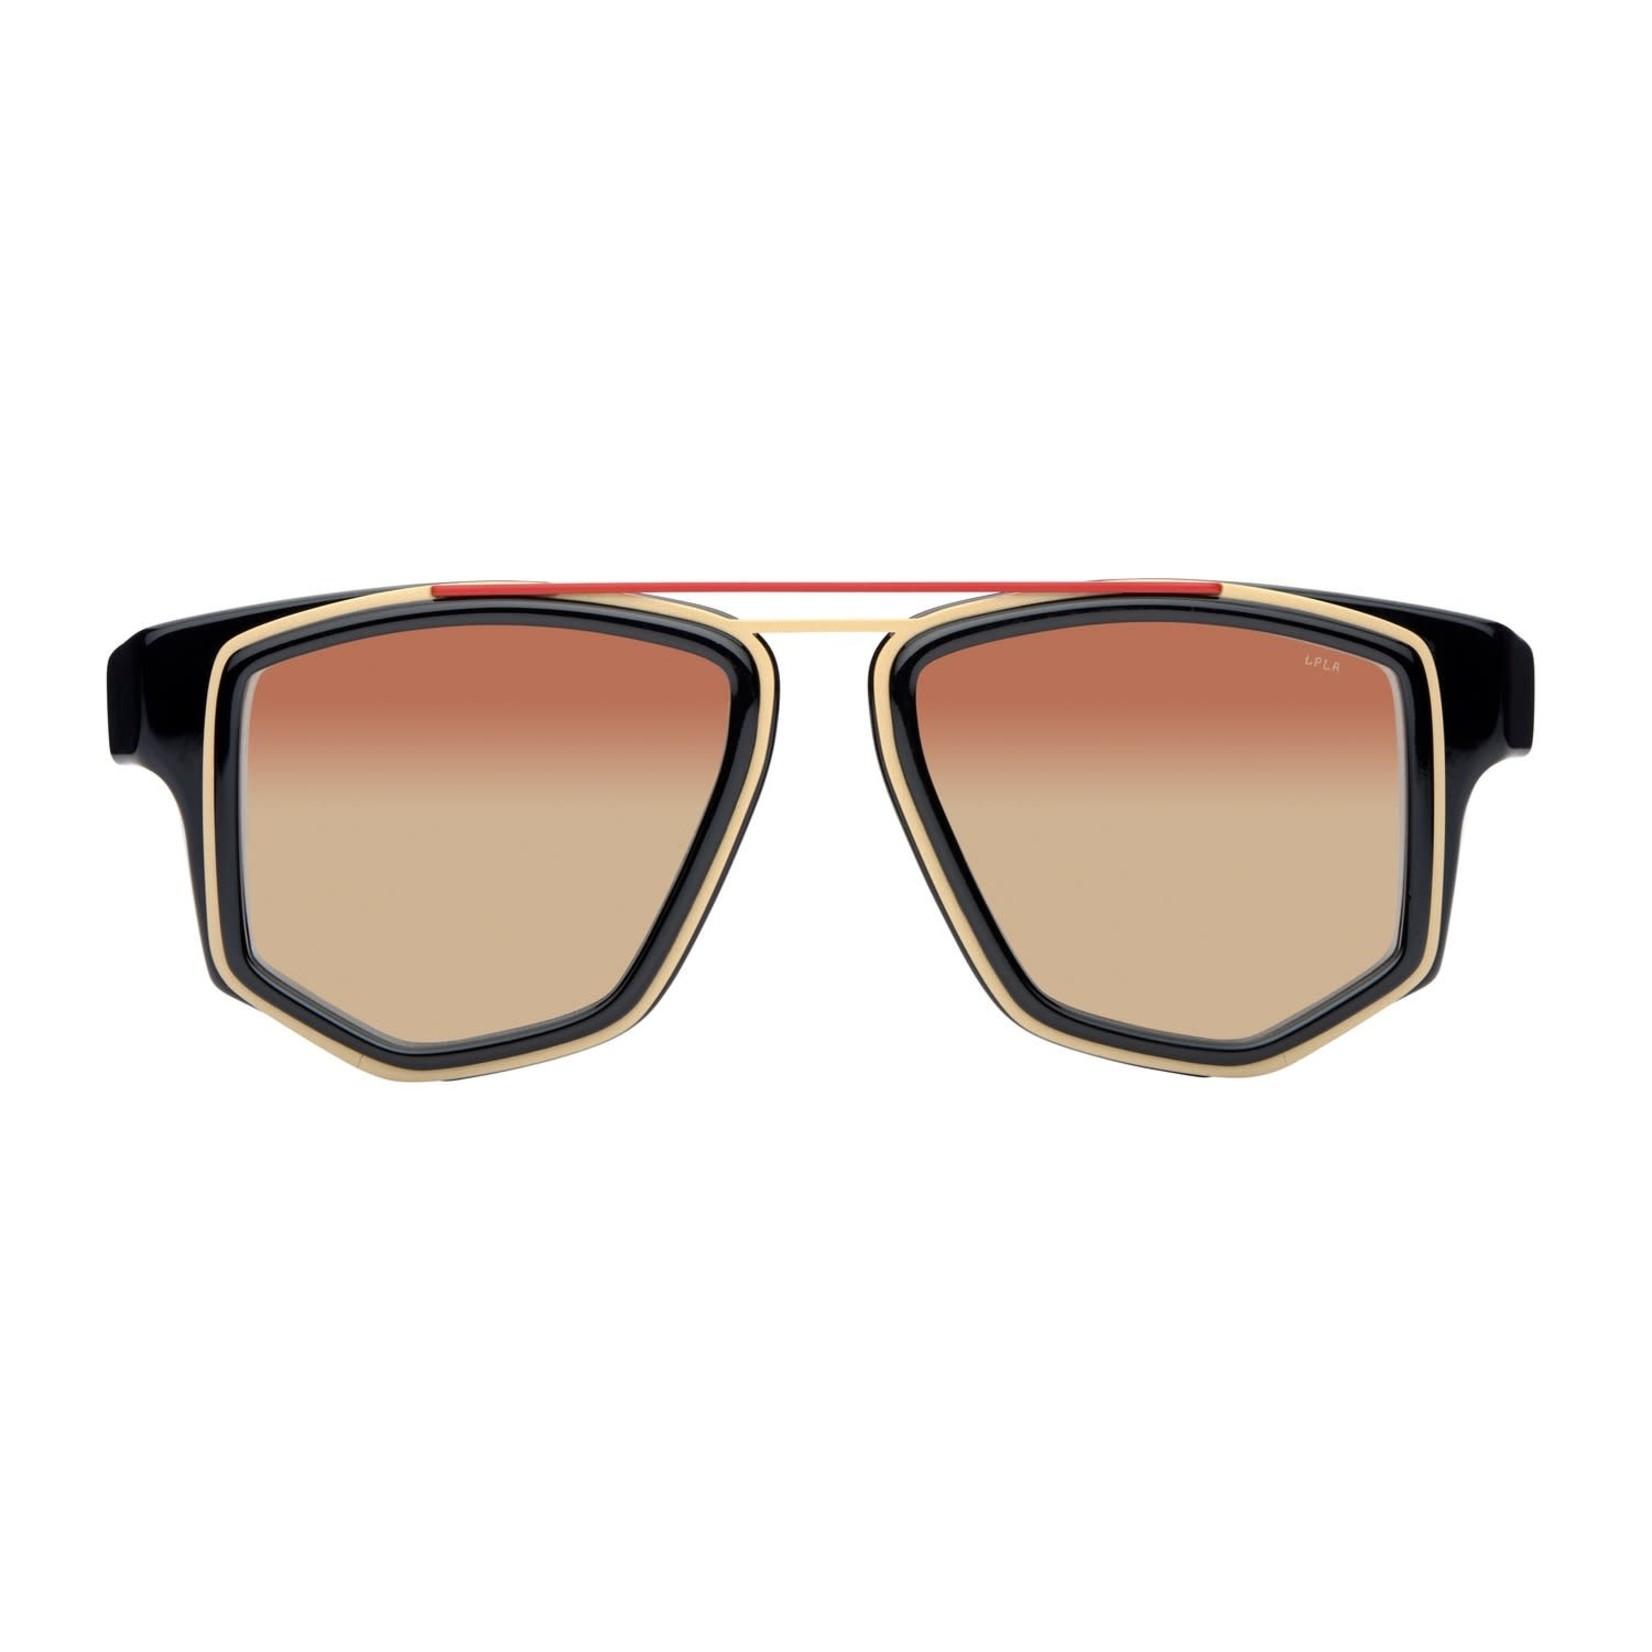 La Petite Lunette Eyewear LPLR Ocpassi Sun